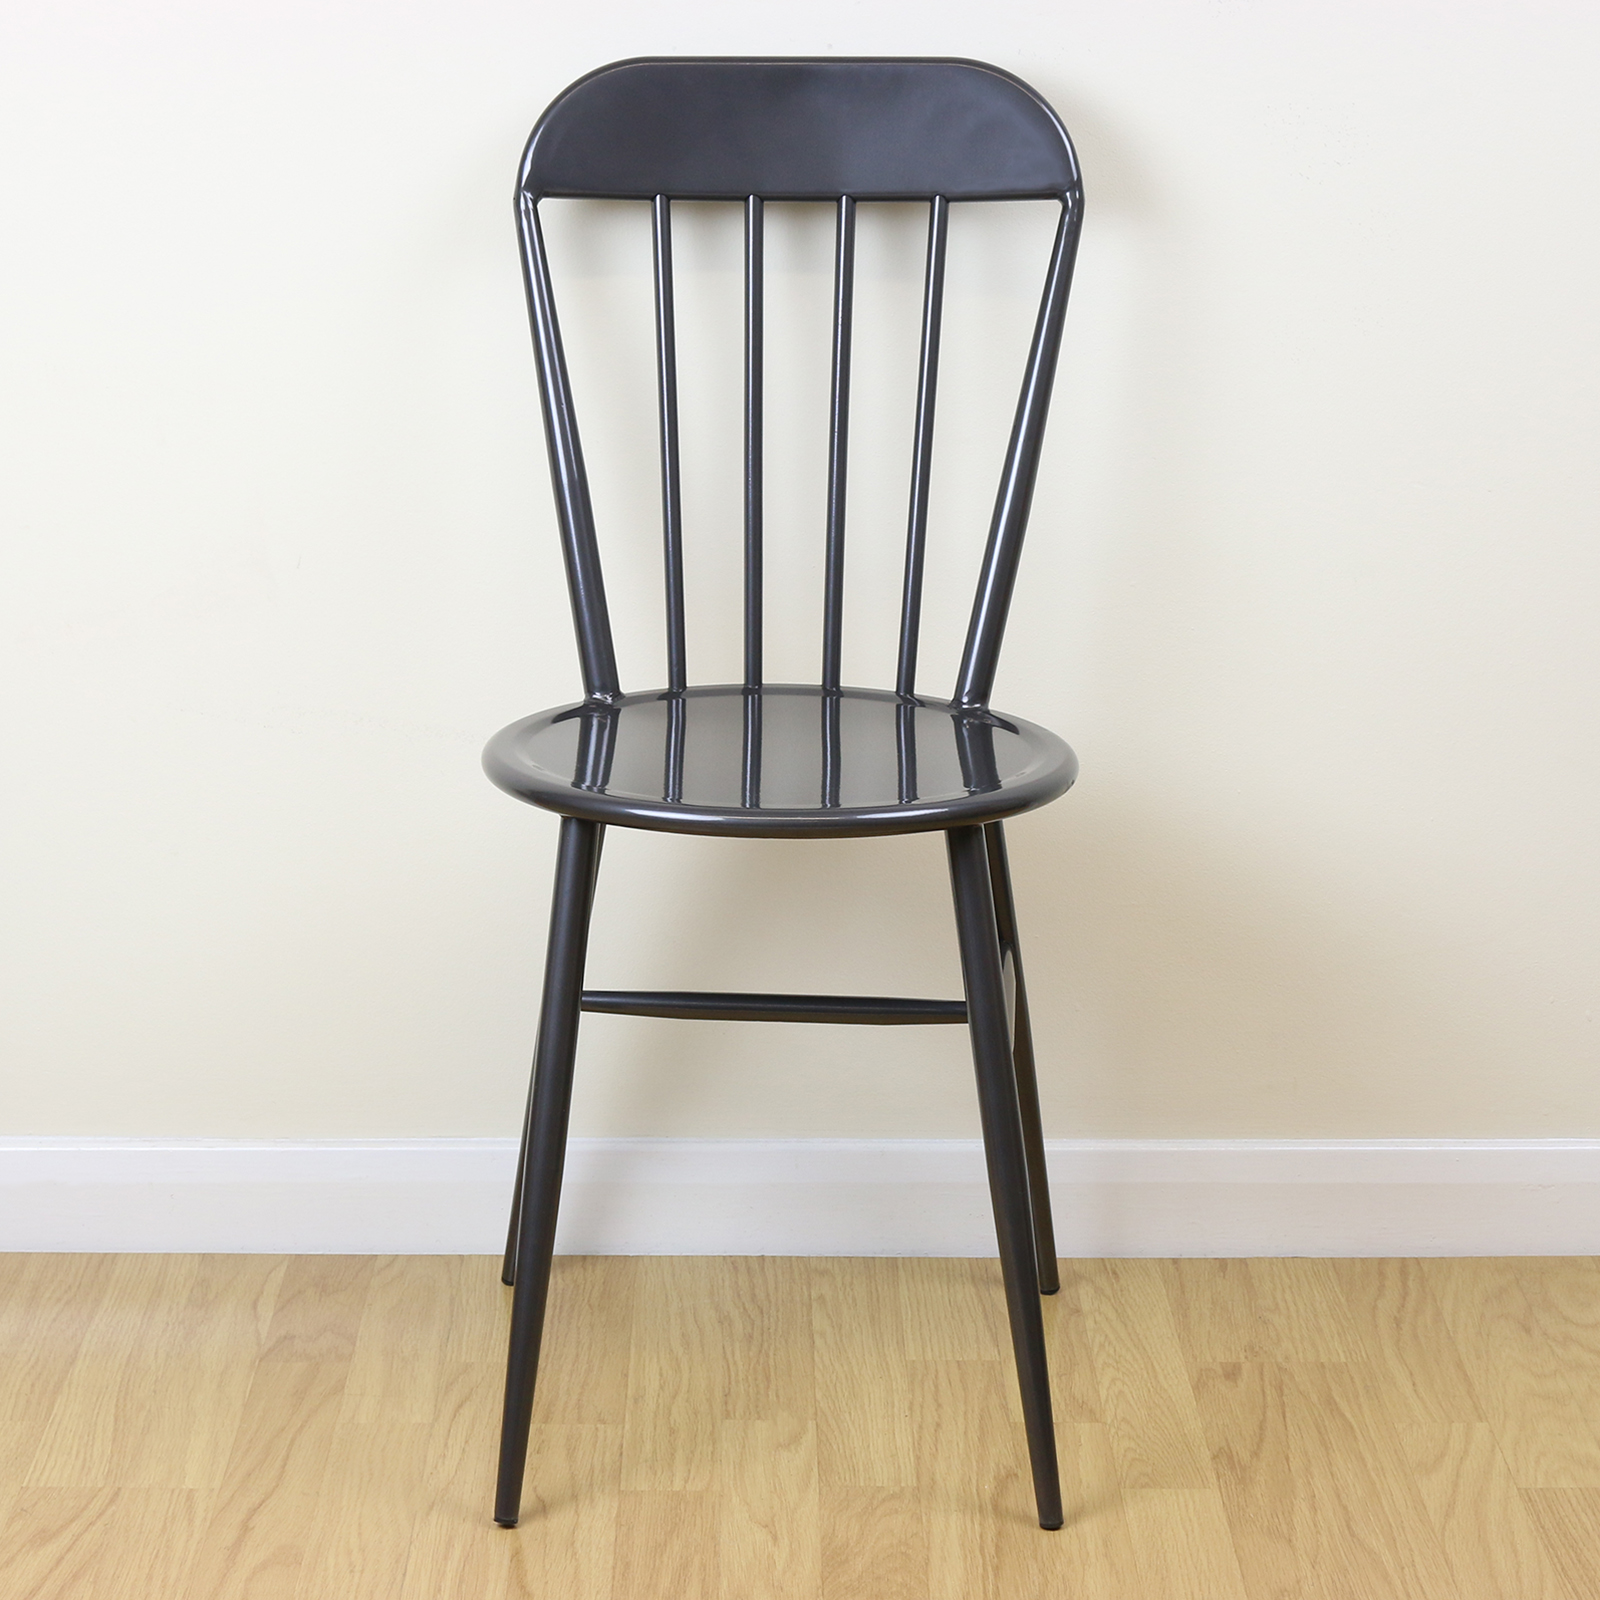 set of 2 grey metal industrial dining chairs kitchen bistro vintage style seats ebay. Black Bedroom Furniture Sets. Home Design Ideas